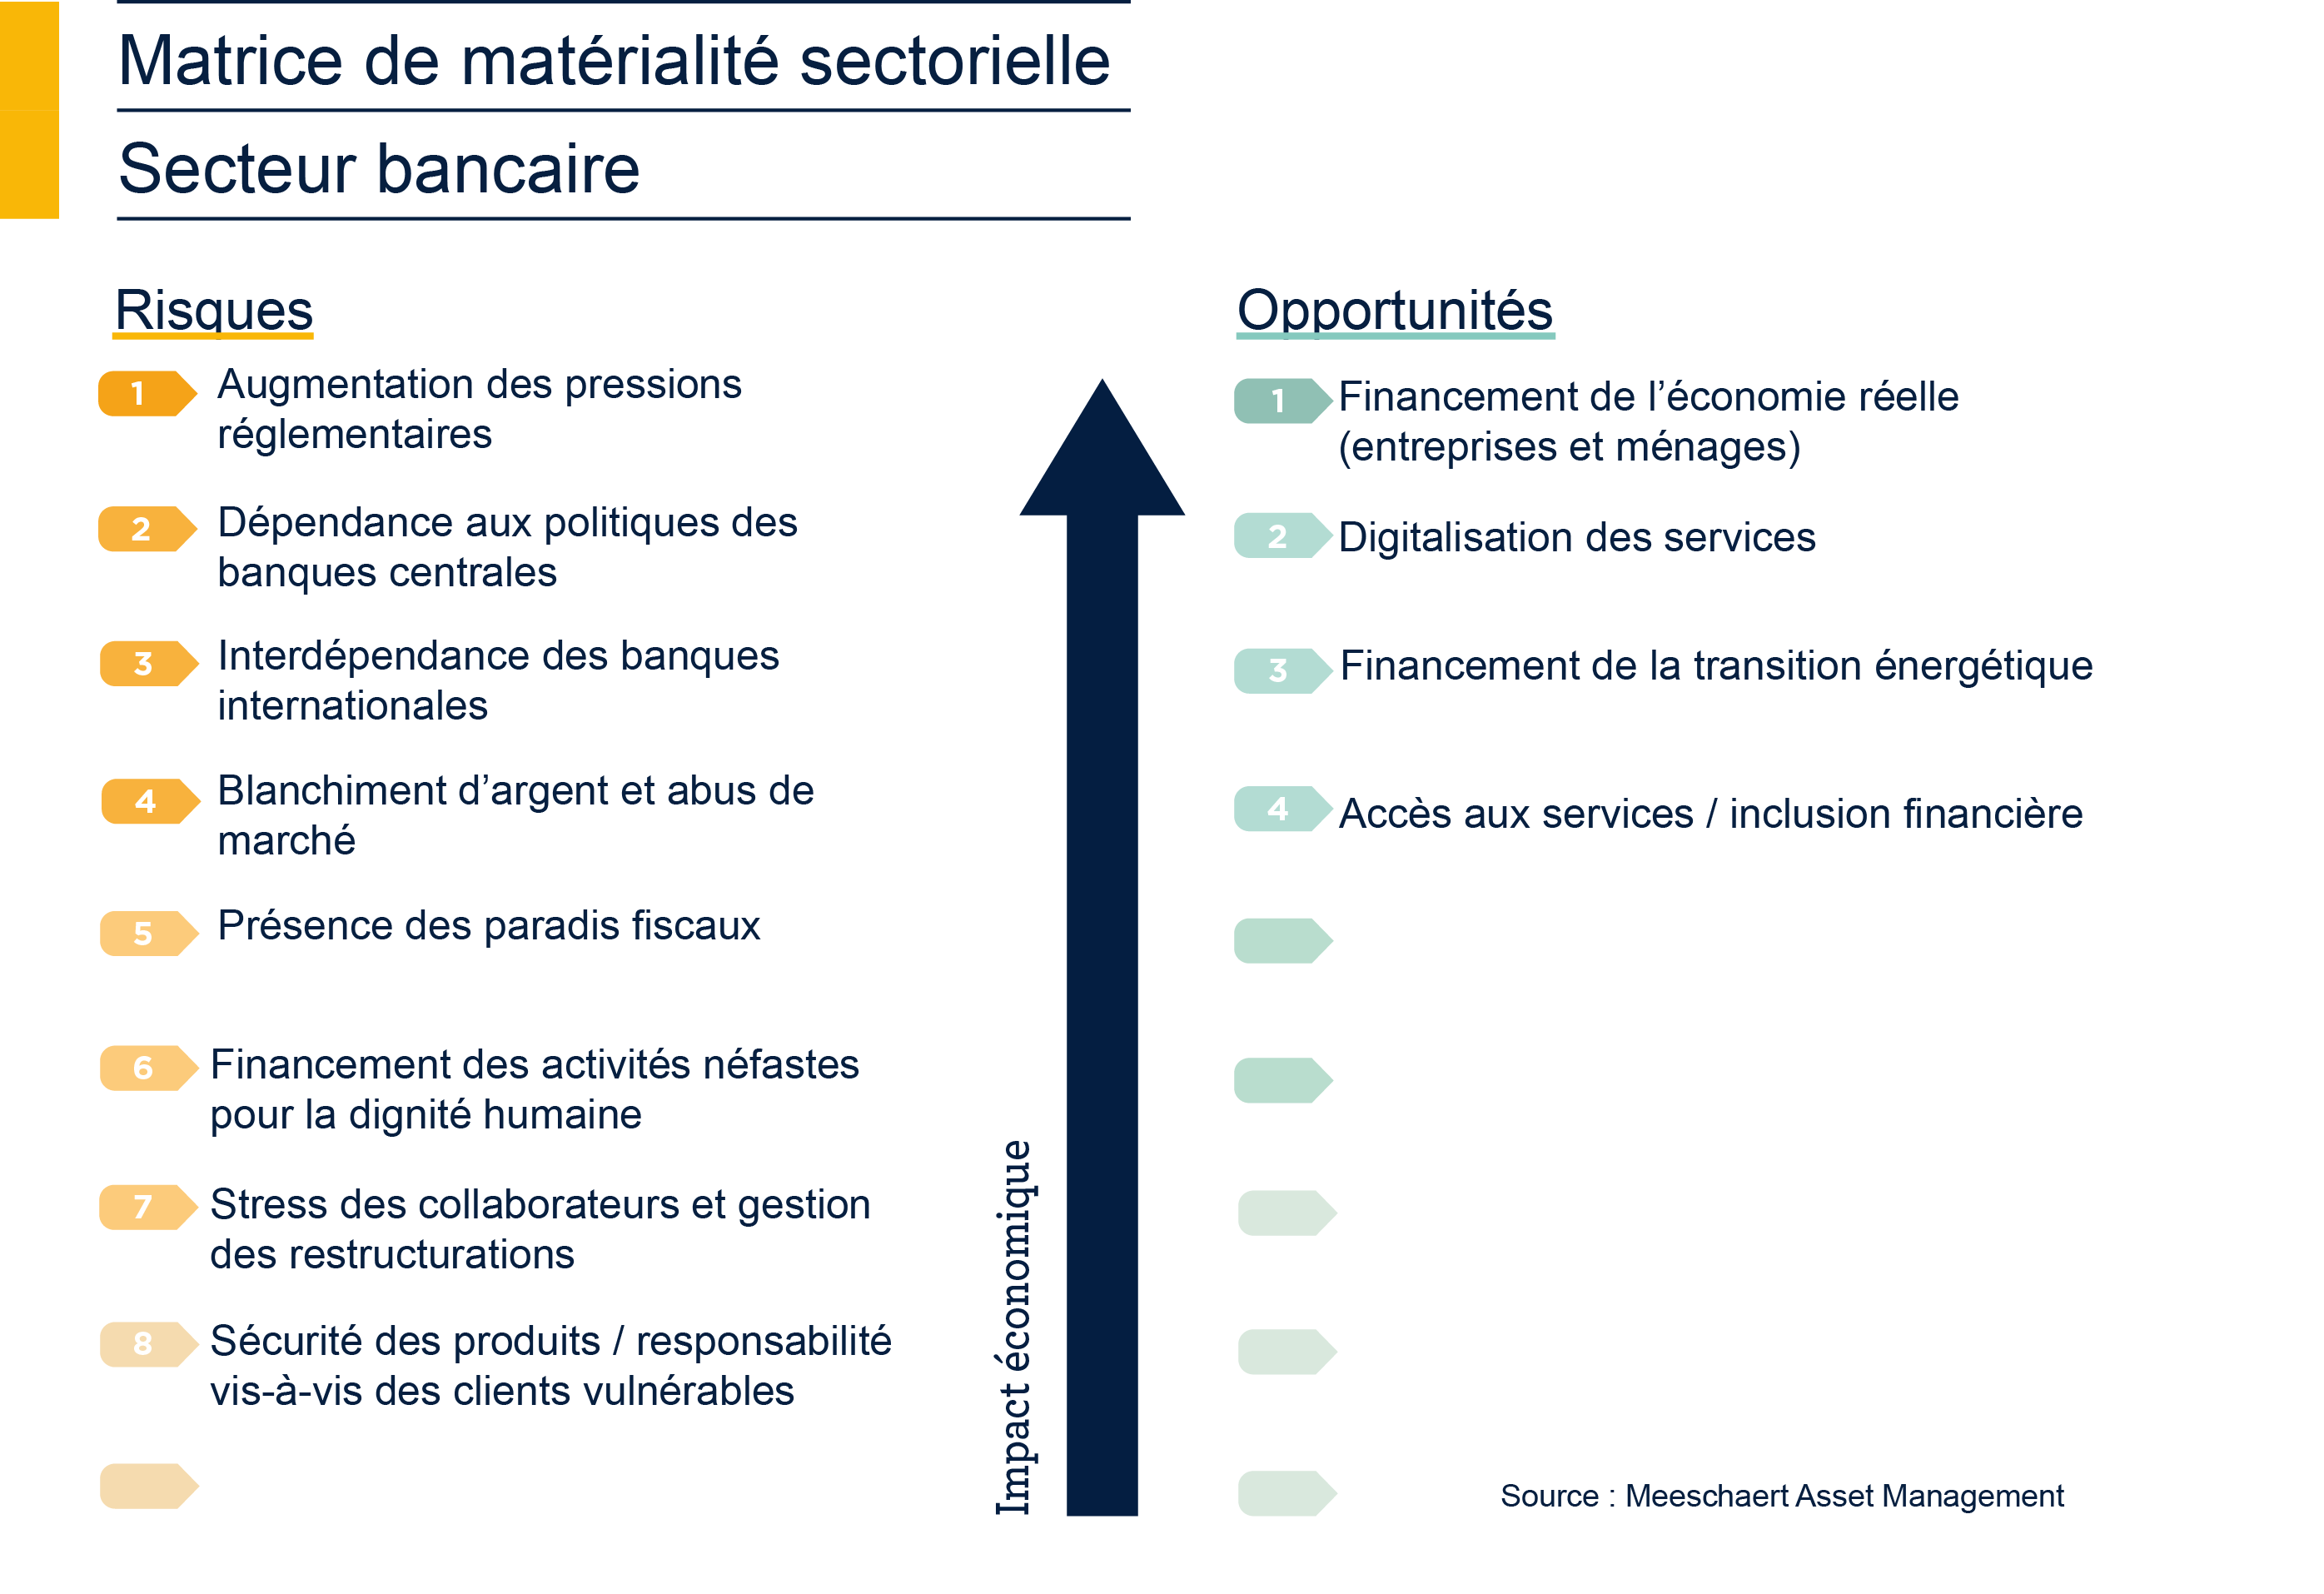 matrice-de-materialite-isr-banque